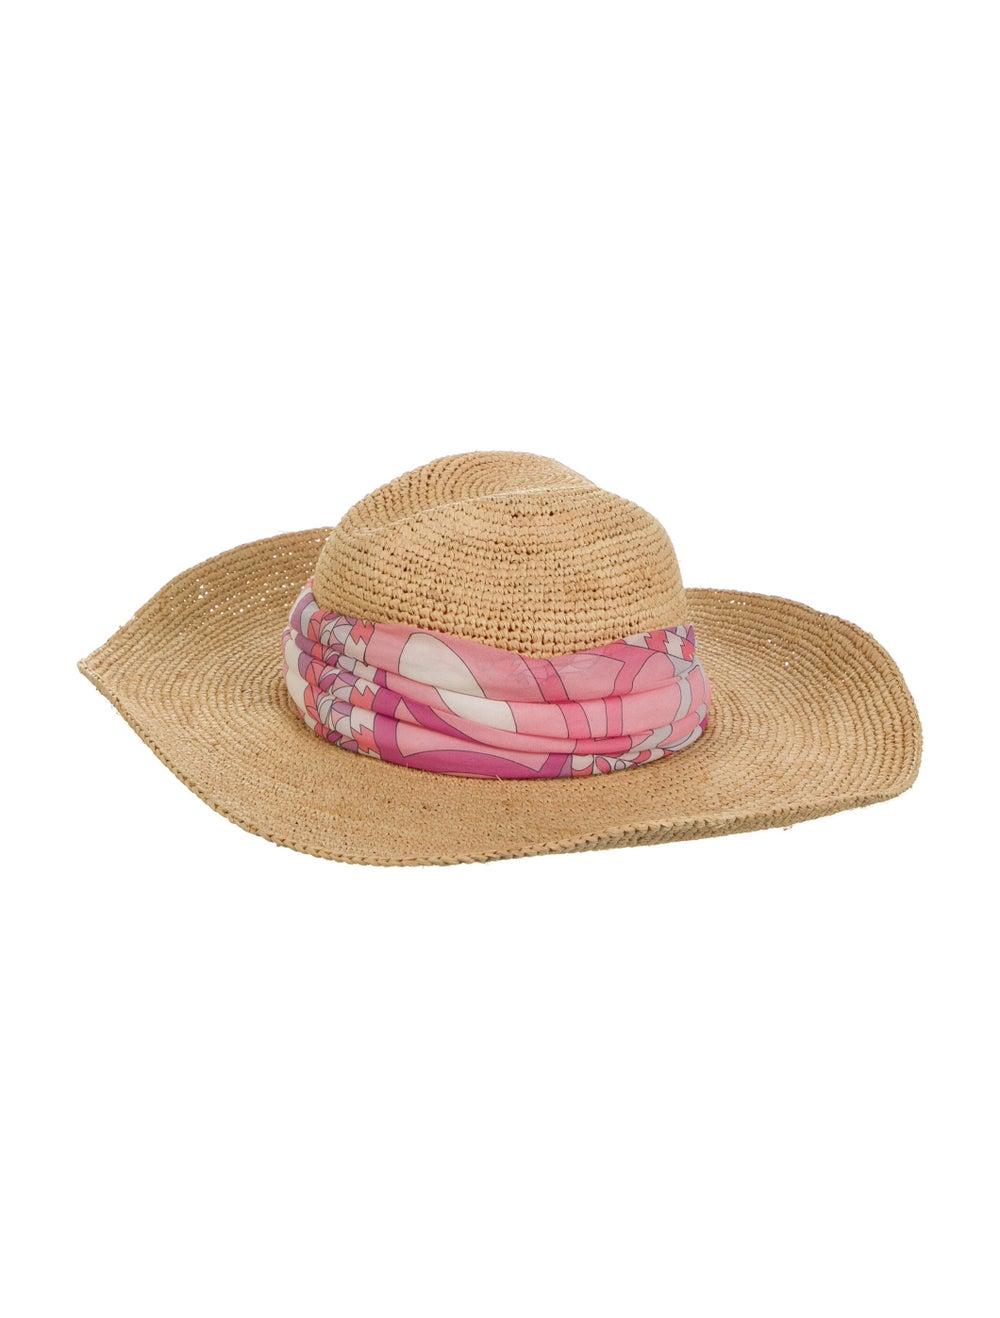 Emilio Pucci Wide Brim Straw Hat Tan - image 1